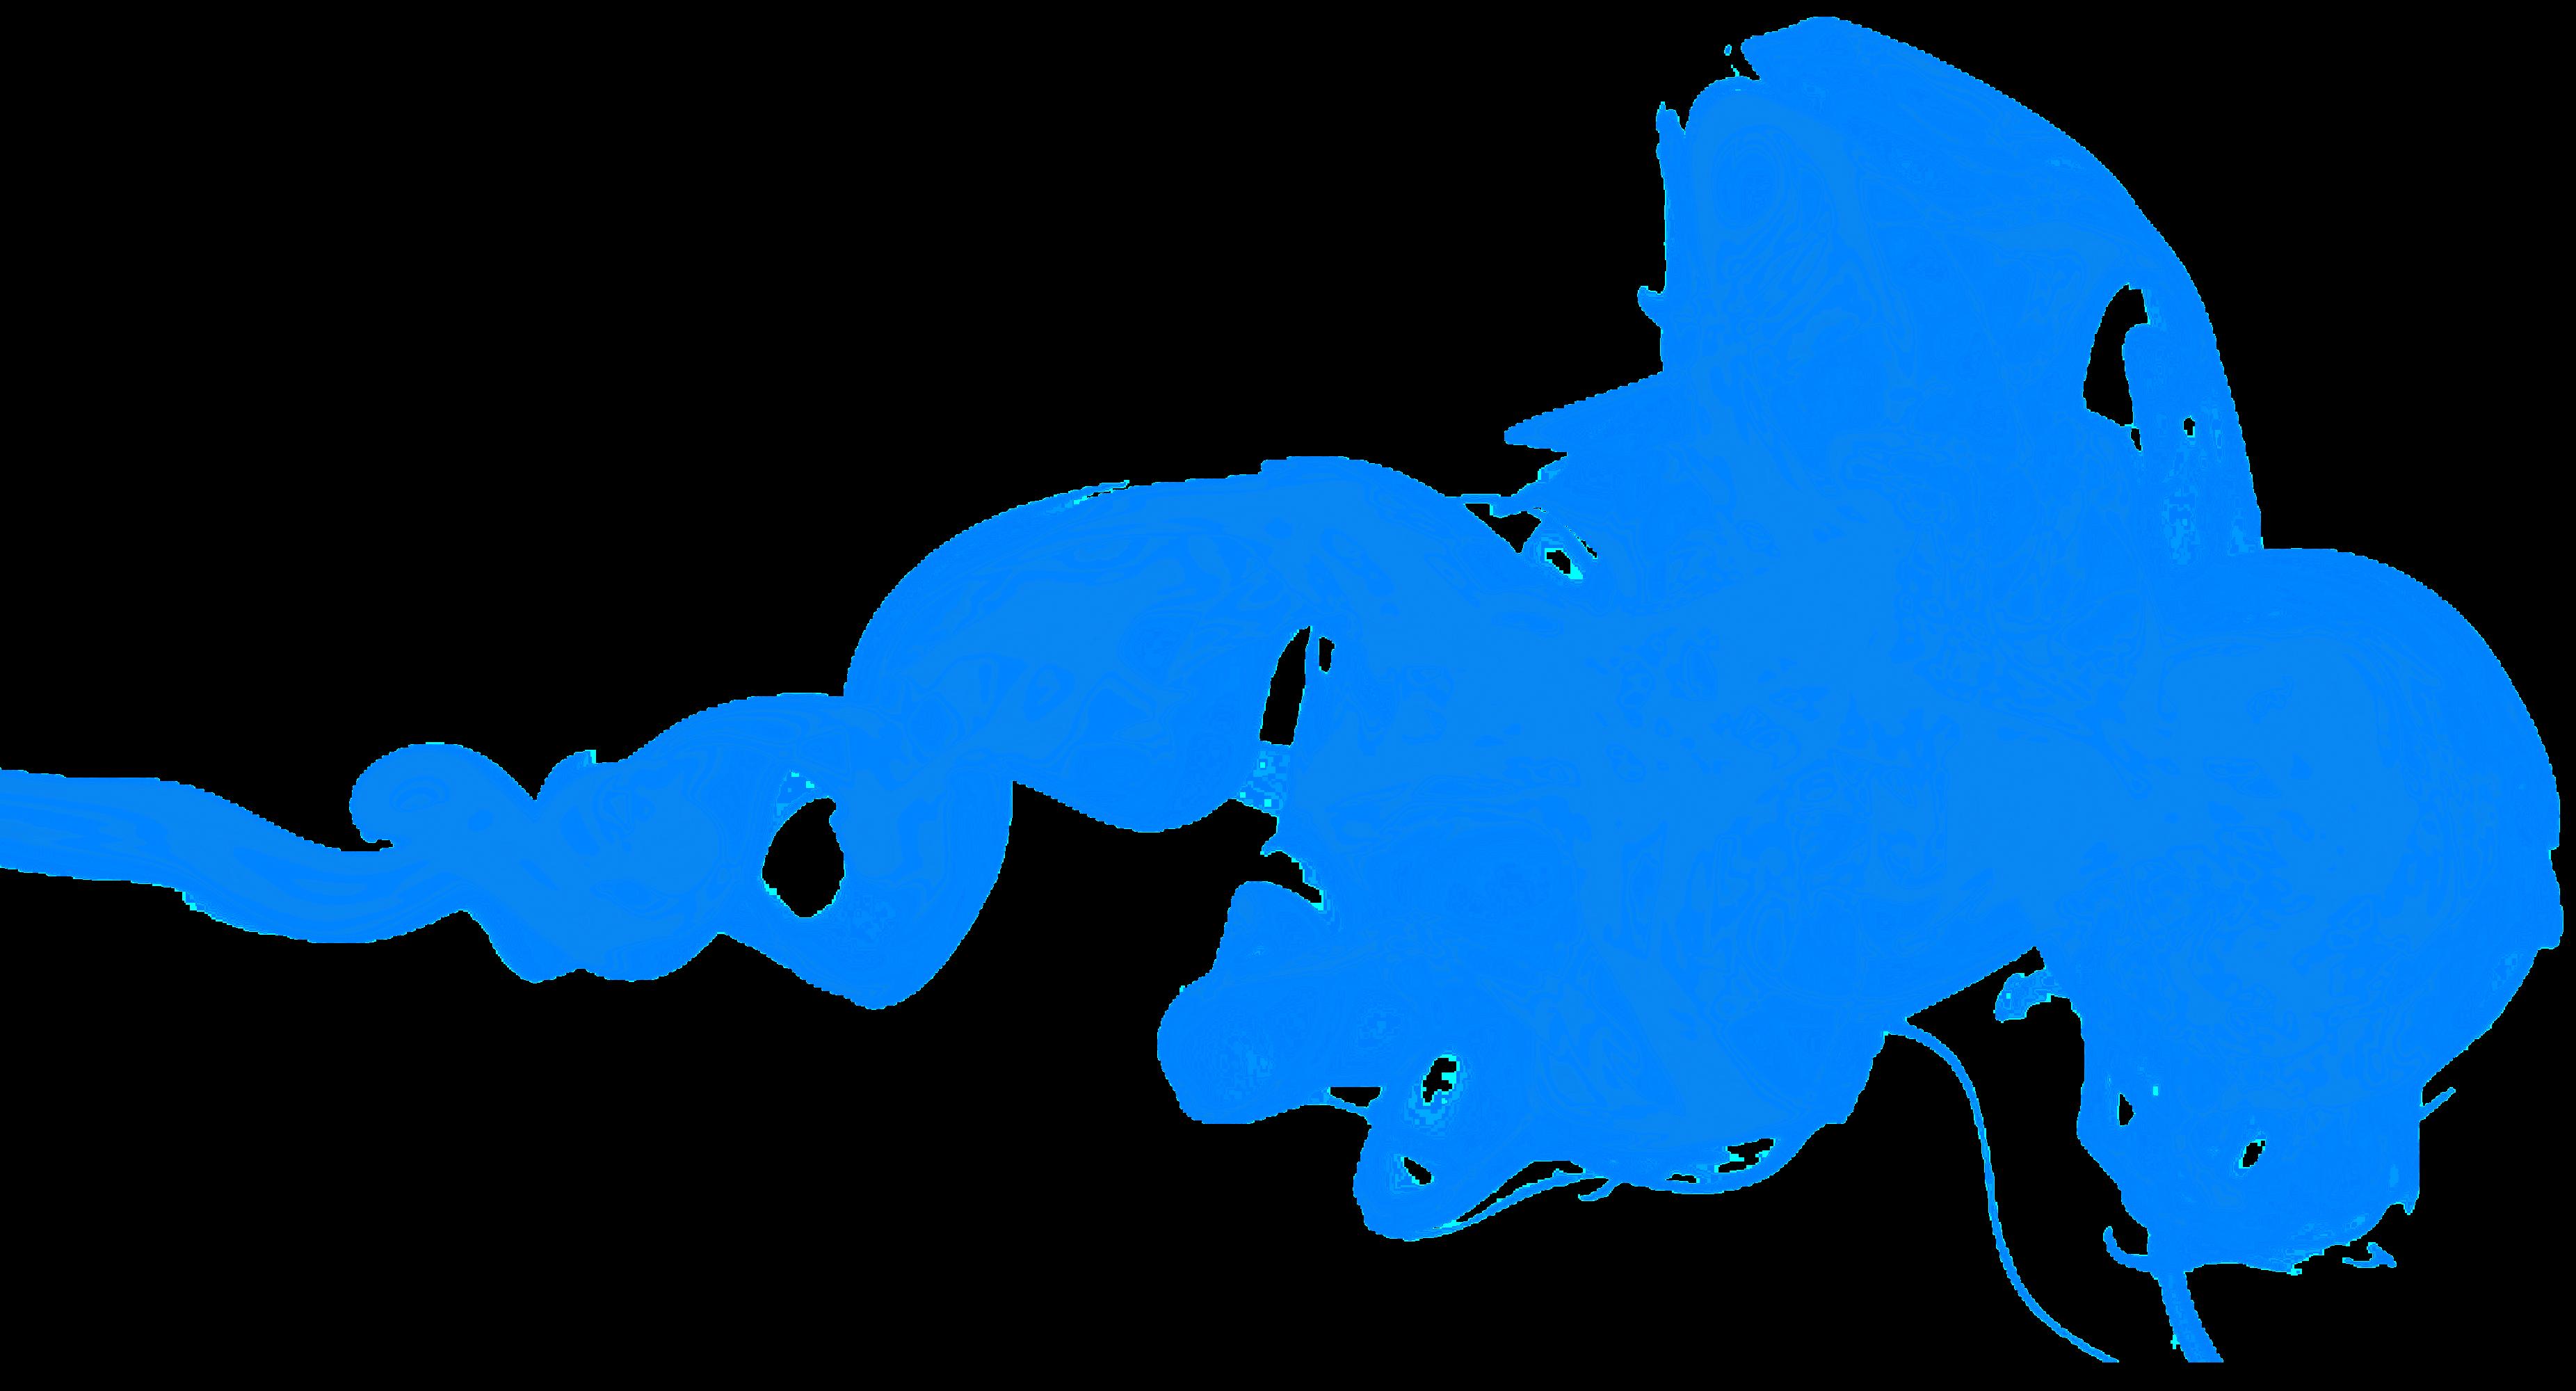 Blue Smoke Transparent | PNG Arts